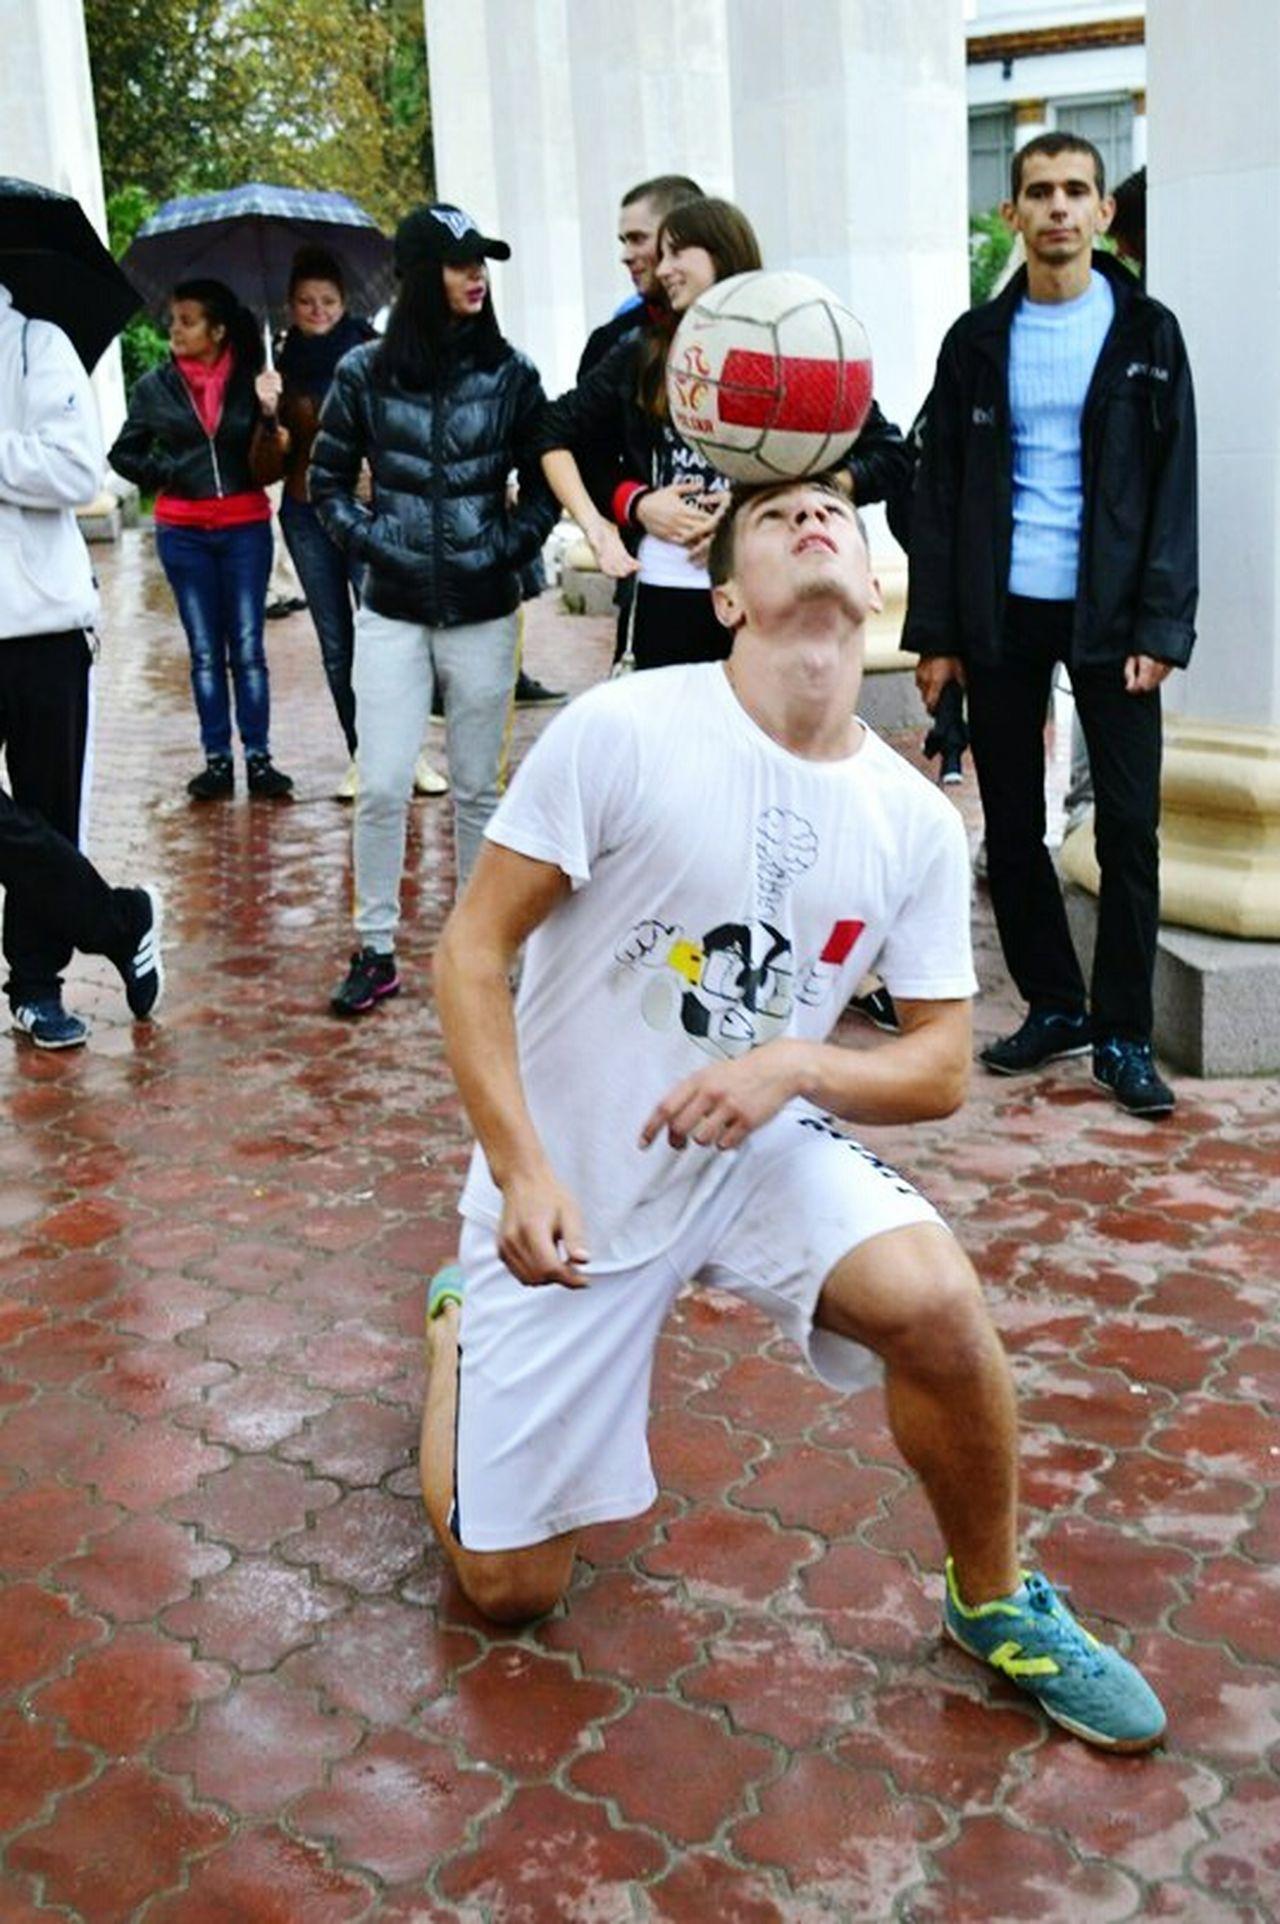 выступление футбол МастерКласс Киев Украина♥ шоу 433 Likeforlike Streetfootball Street Art Football Player First Eyeem Photo Like4like Master Class Skills  Show Football Freestyle